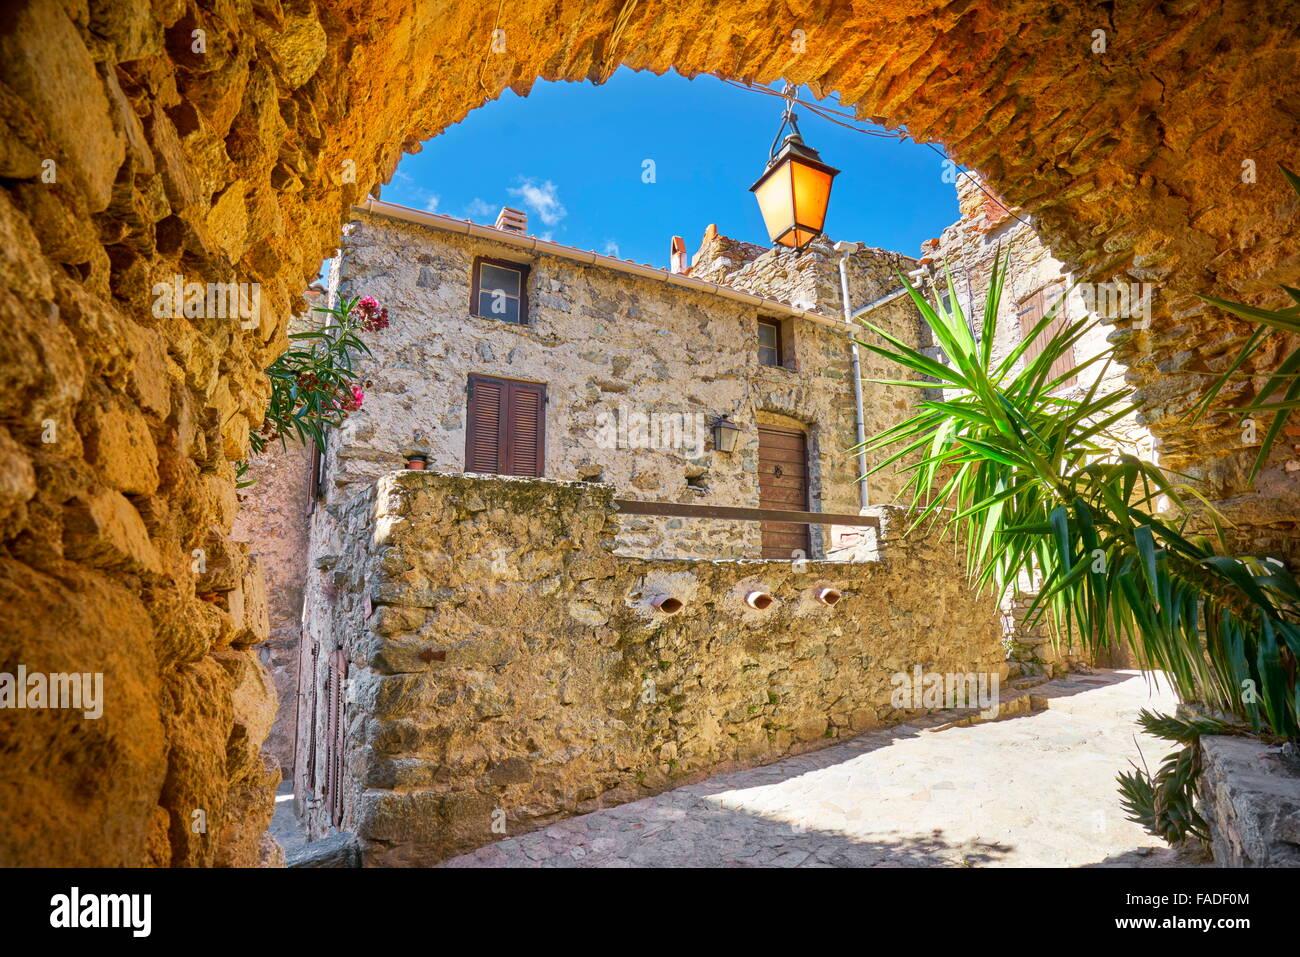 Small mountain village Lama, Balagne, Corsica Island, France - Stock Image